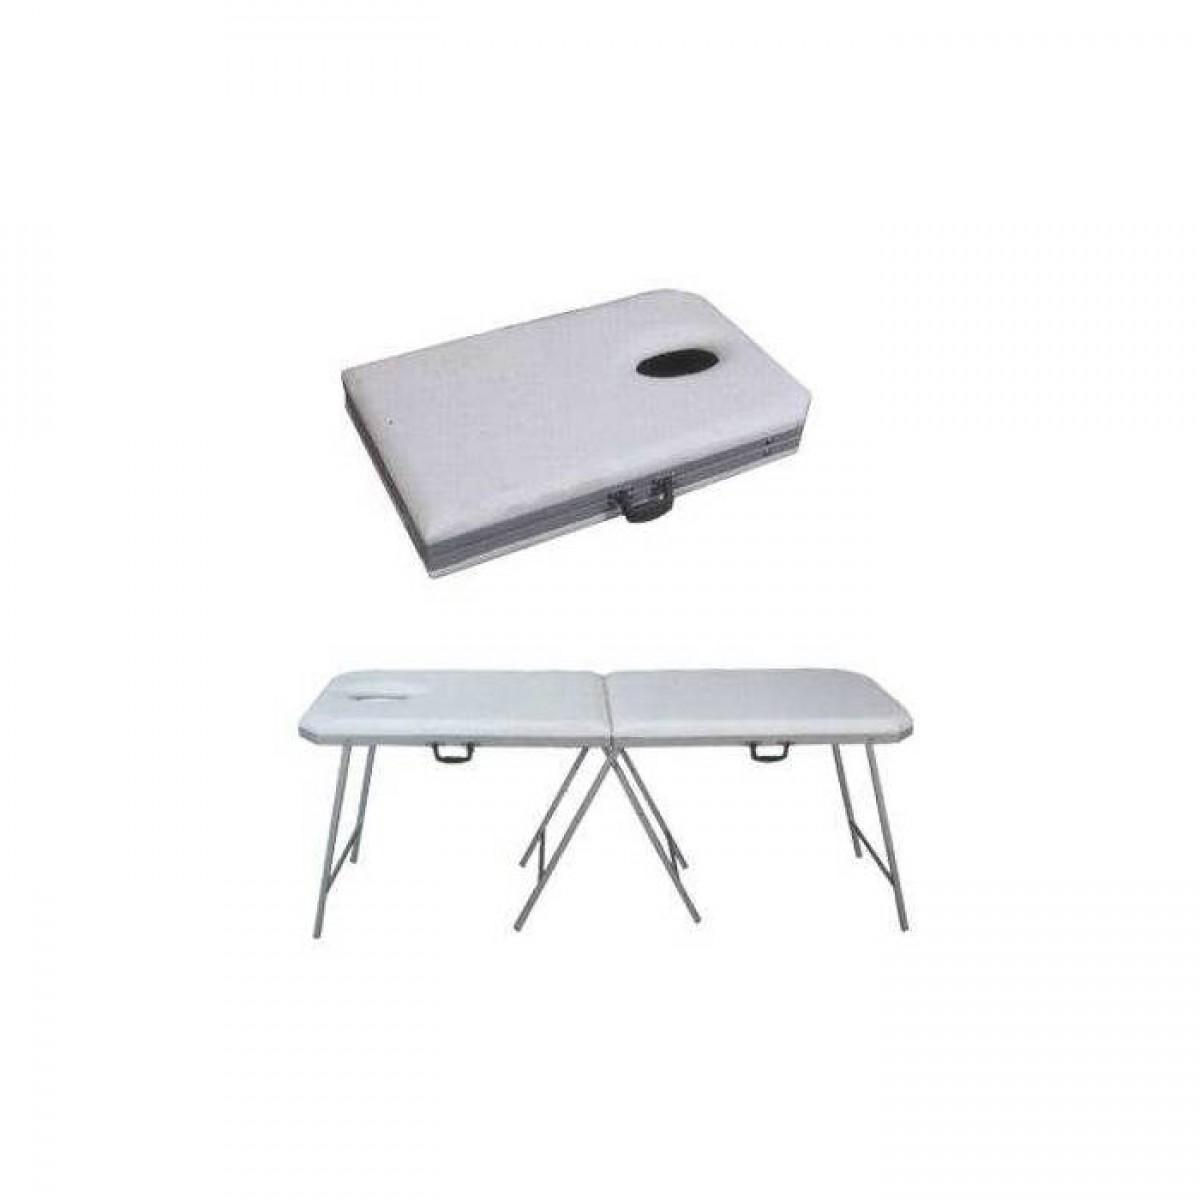 Çanta Tipi Masaj Masası (Katlanır Ayaklı)